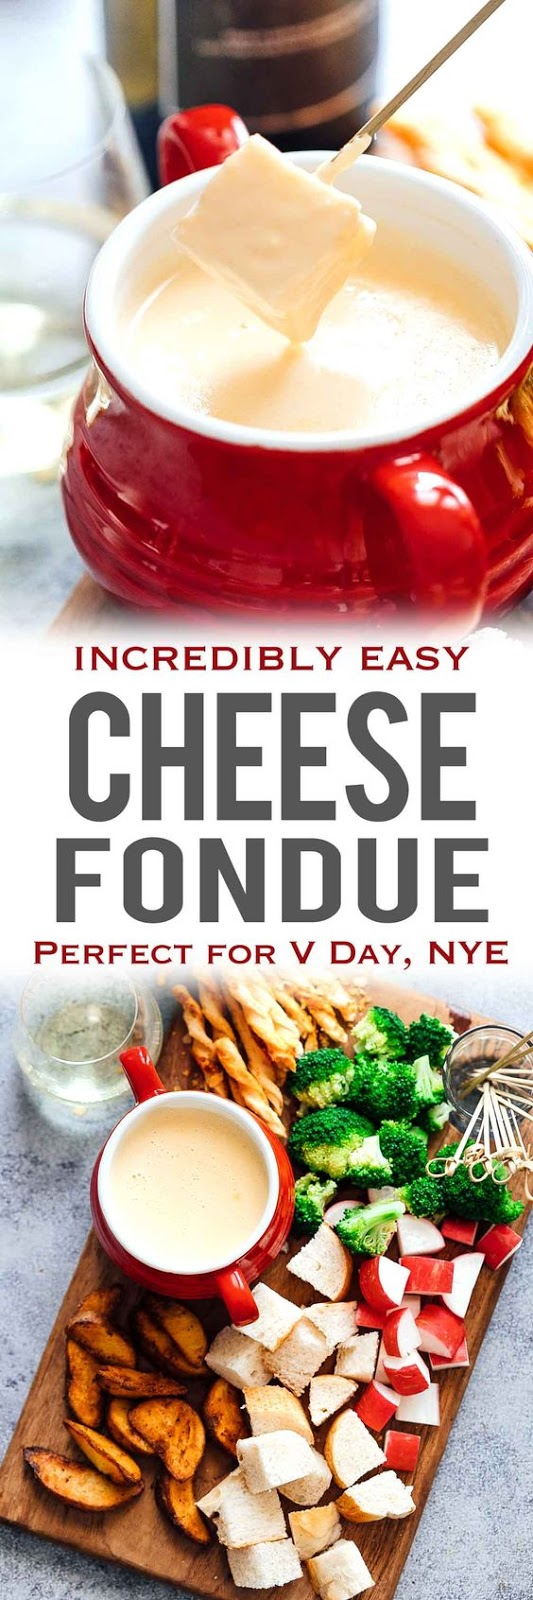 Easy Cheese Fondue Recipe With White Wine